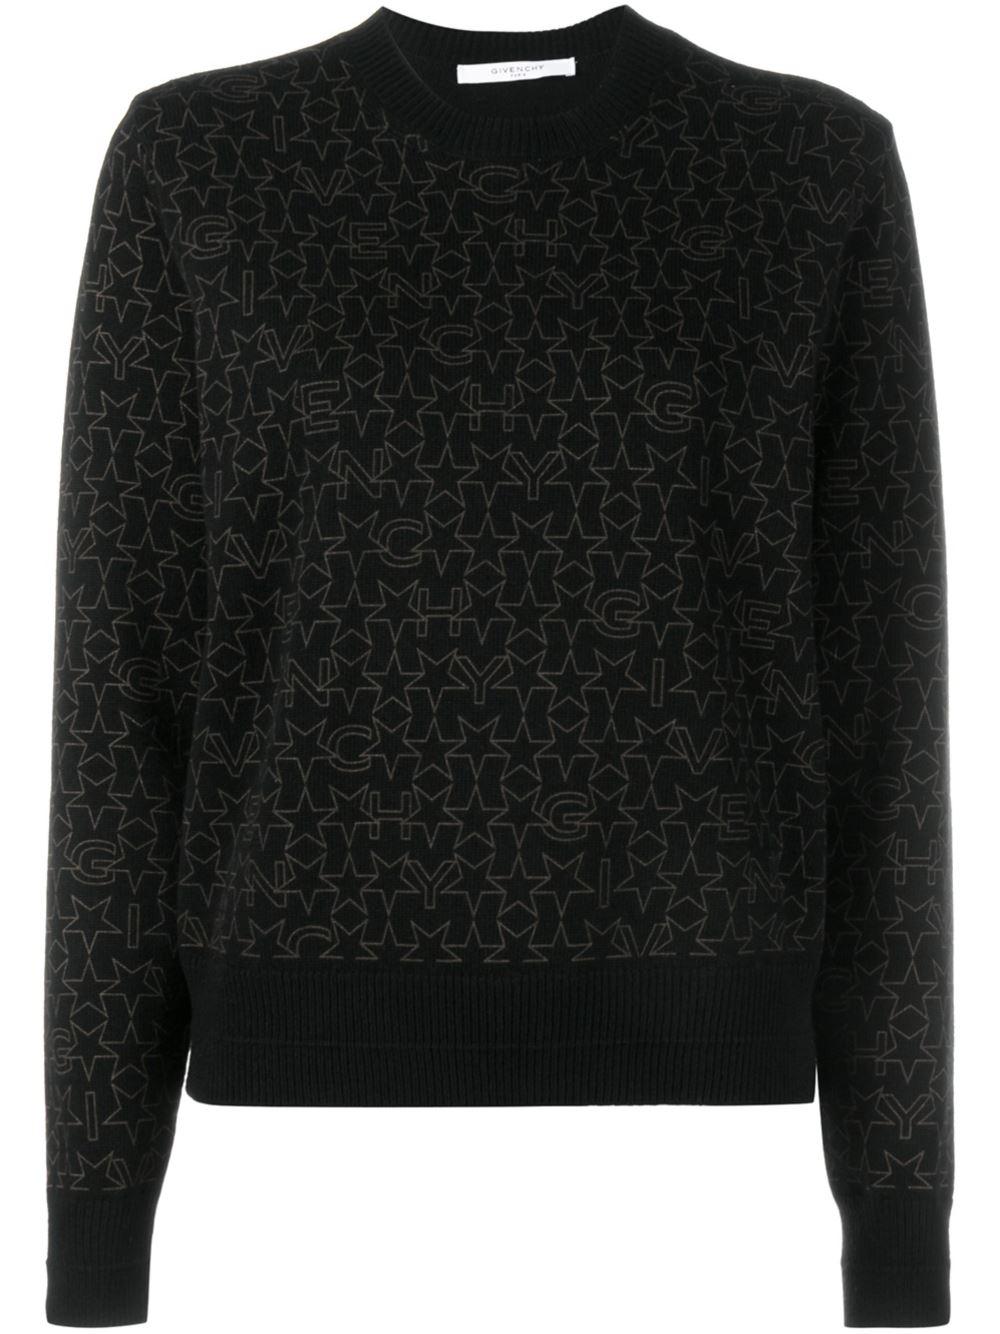 Givenchy MAGLIA